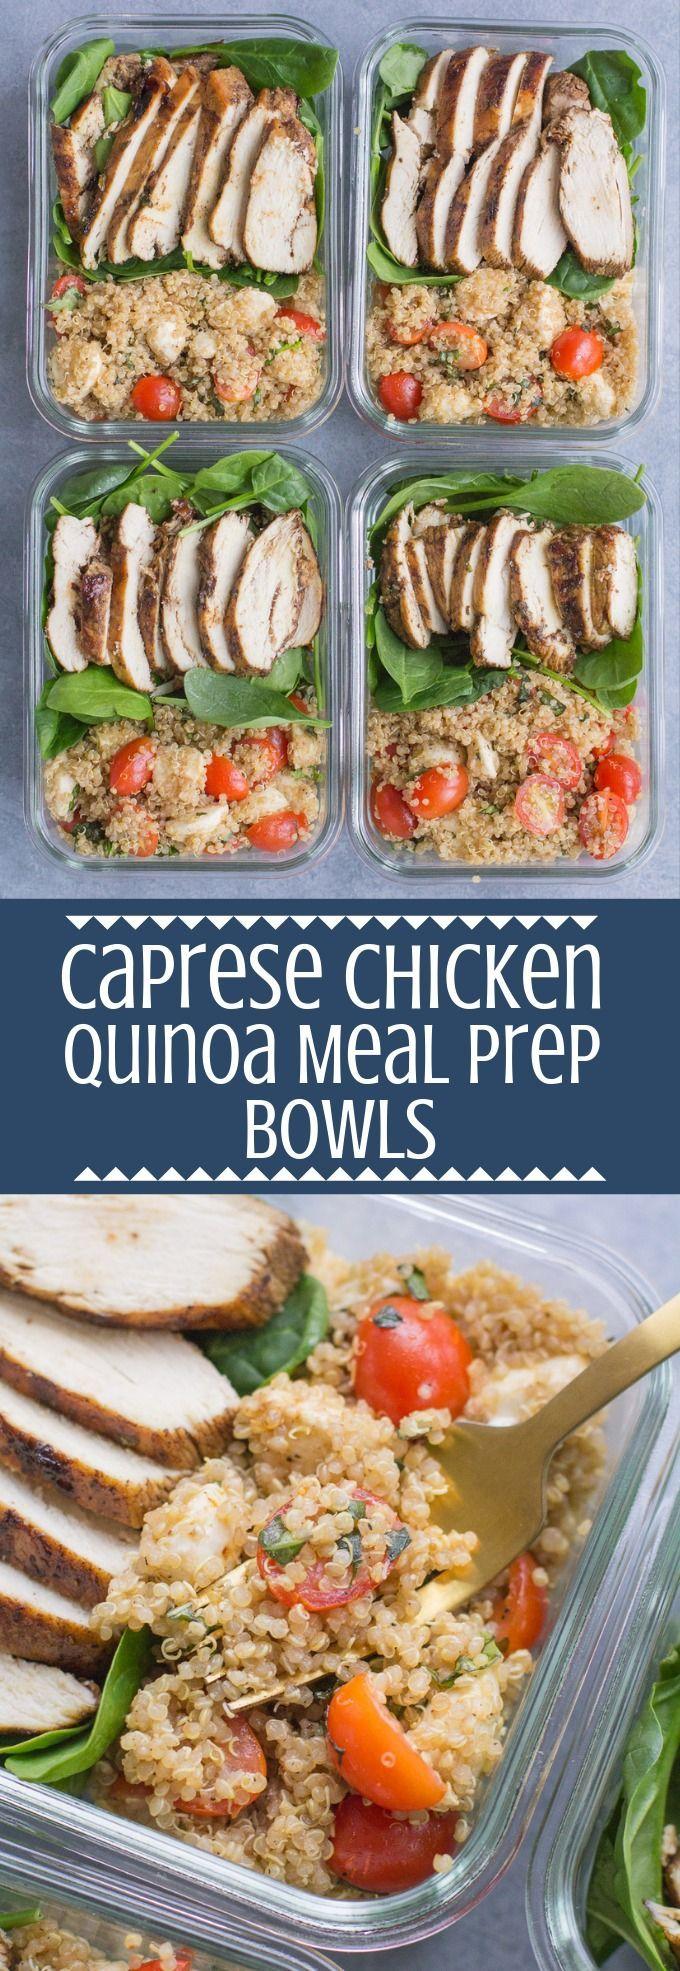 Chicken Caprese Quinoa Meal Prep Bowls -